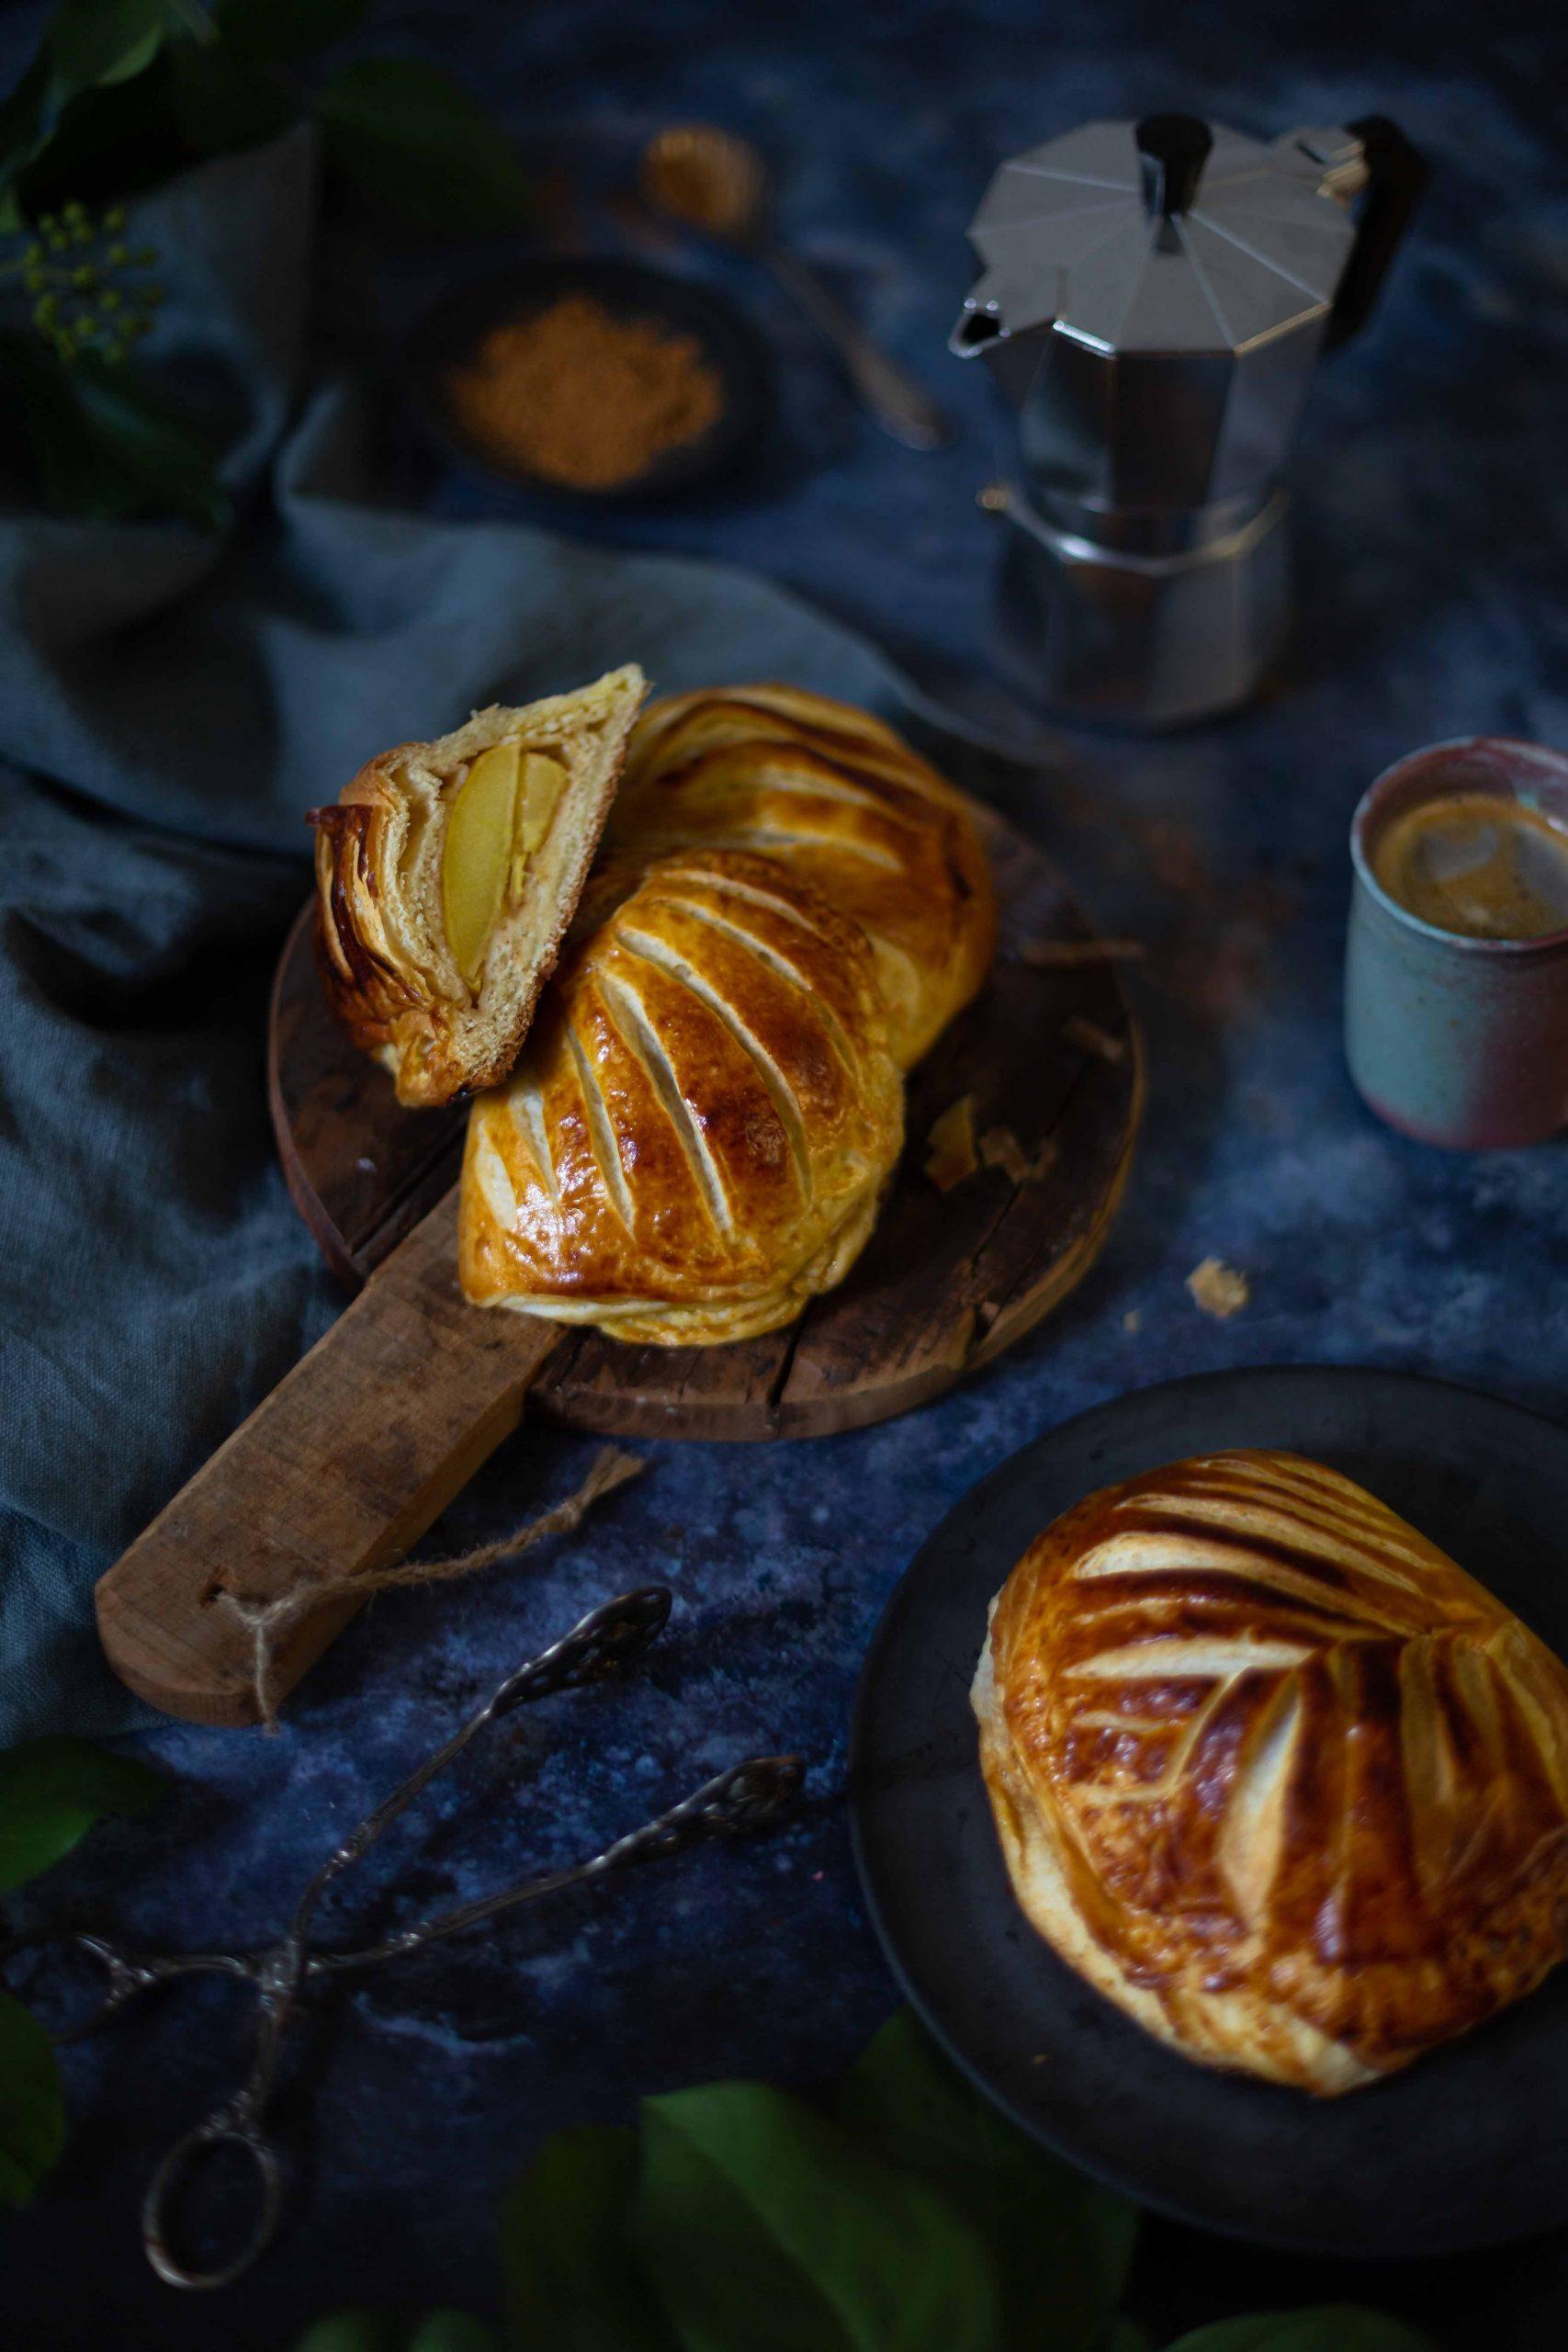 Chaussons aux Pommes à la Cedric Grolet | Französische Apfeltaschen aus Croissantteig (Buchrezension) | Rezept